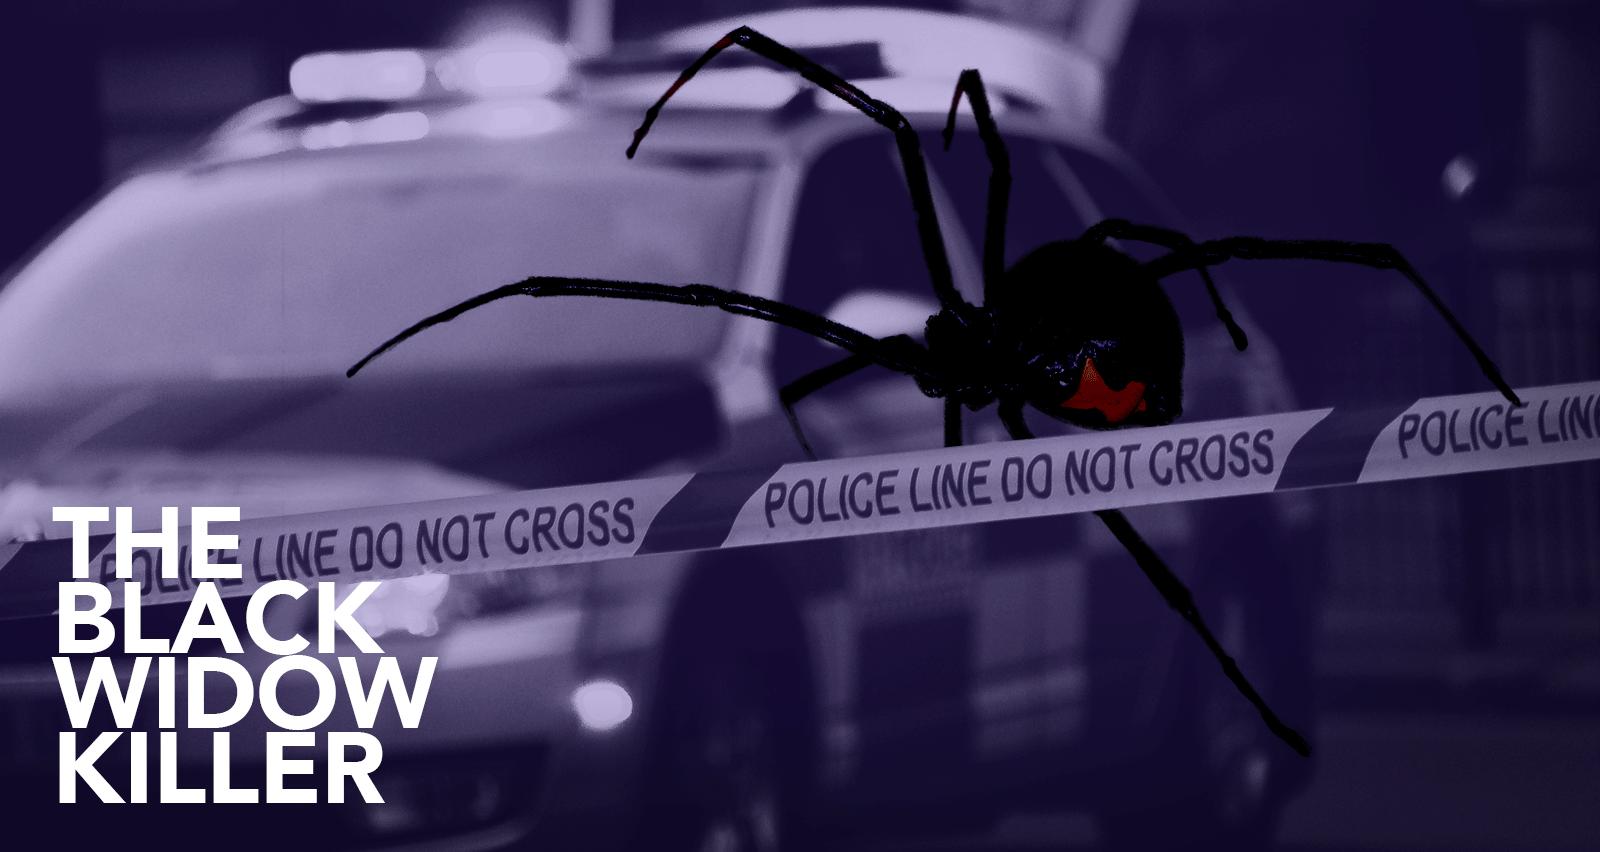 The Black Widow Killer investigation